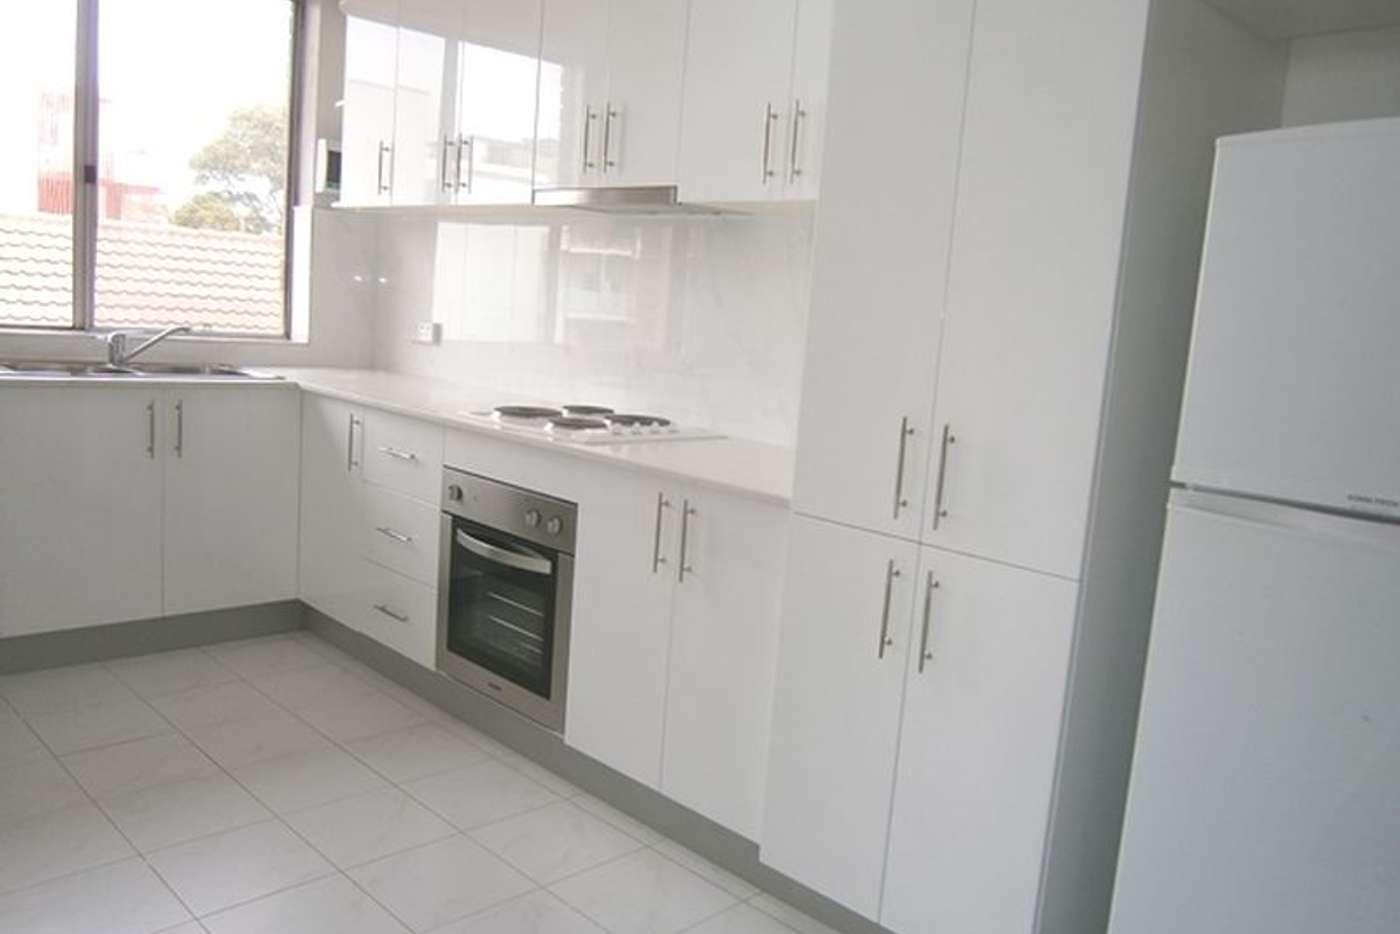 Main view of Homely unit listing, 6/50 Chapel Street, Kogarah NSW 2217